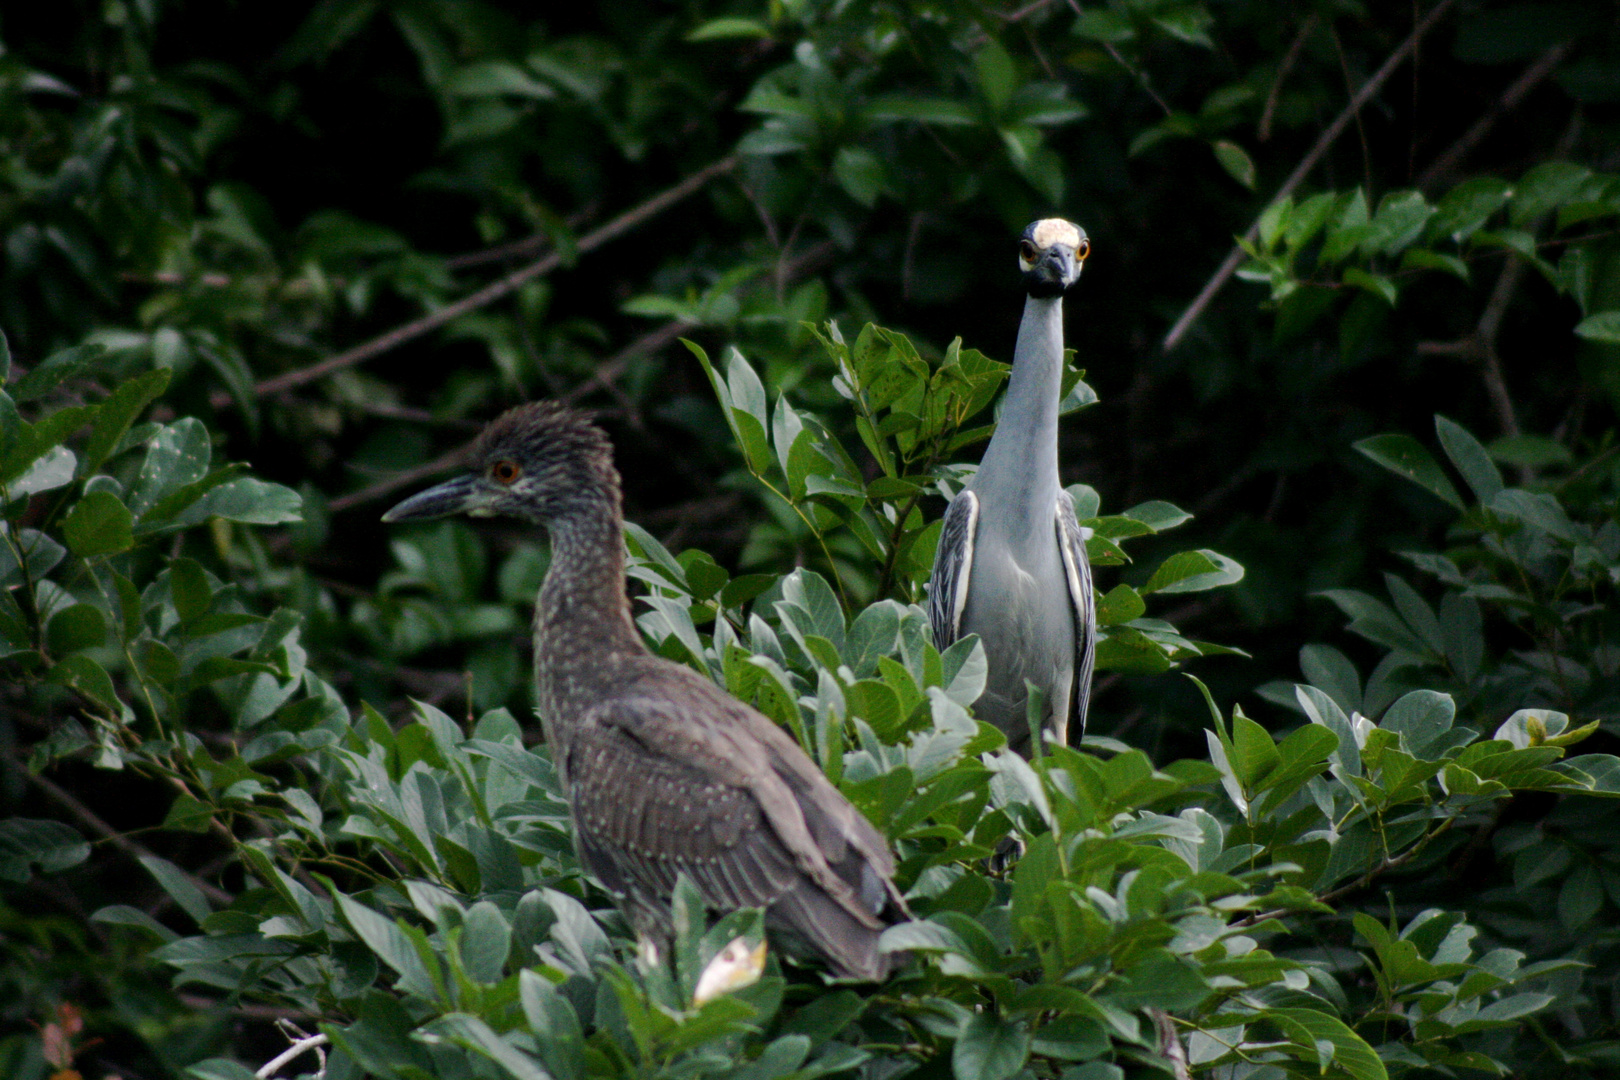 jungel birds